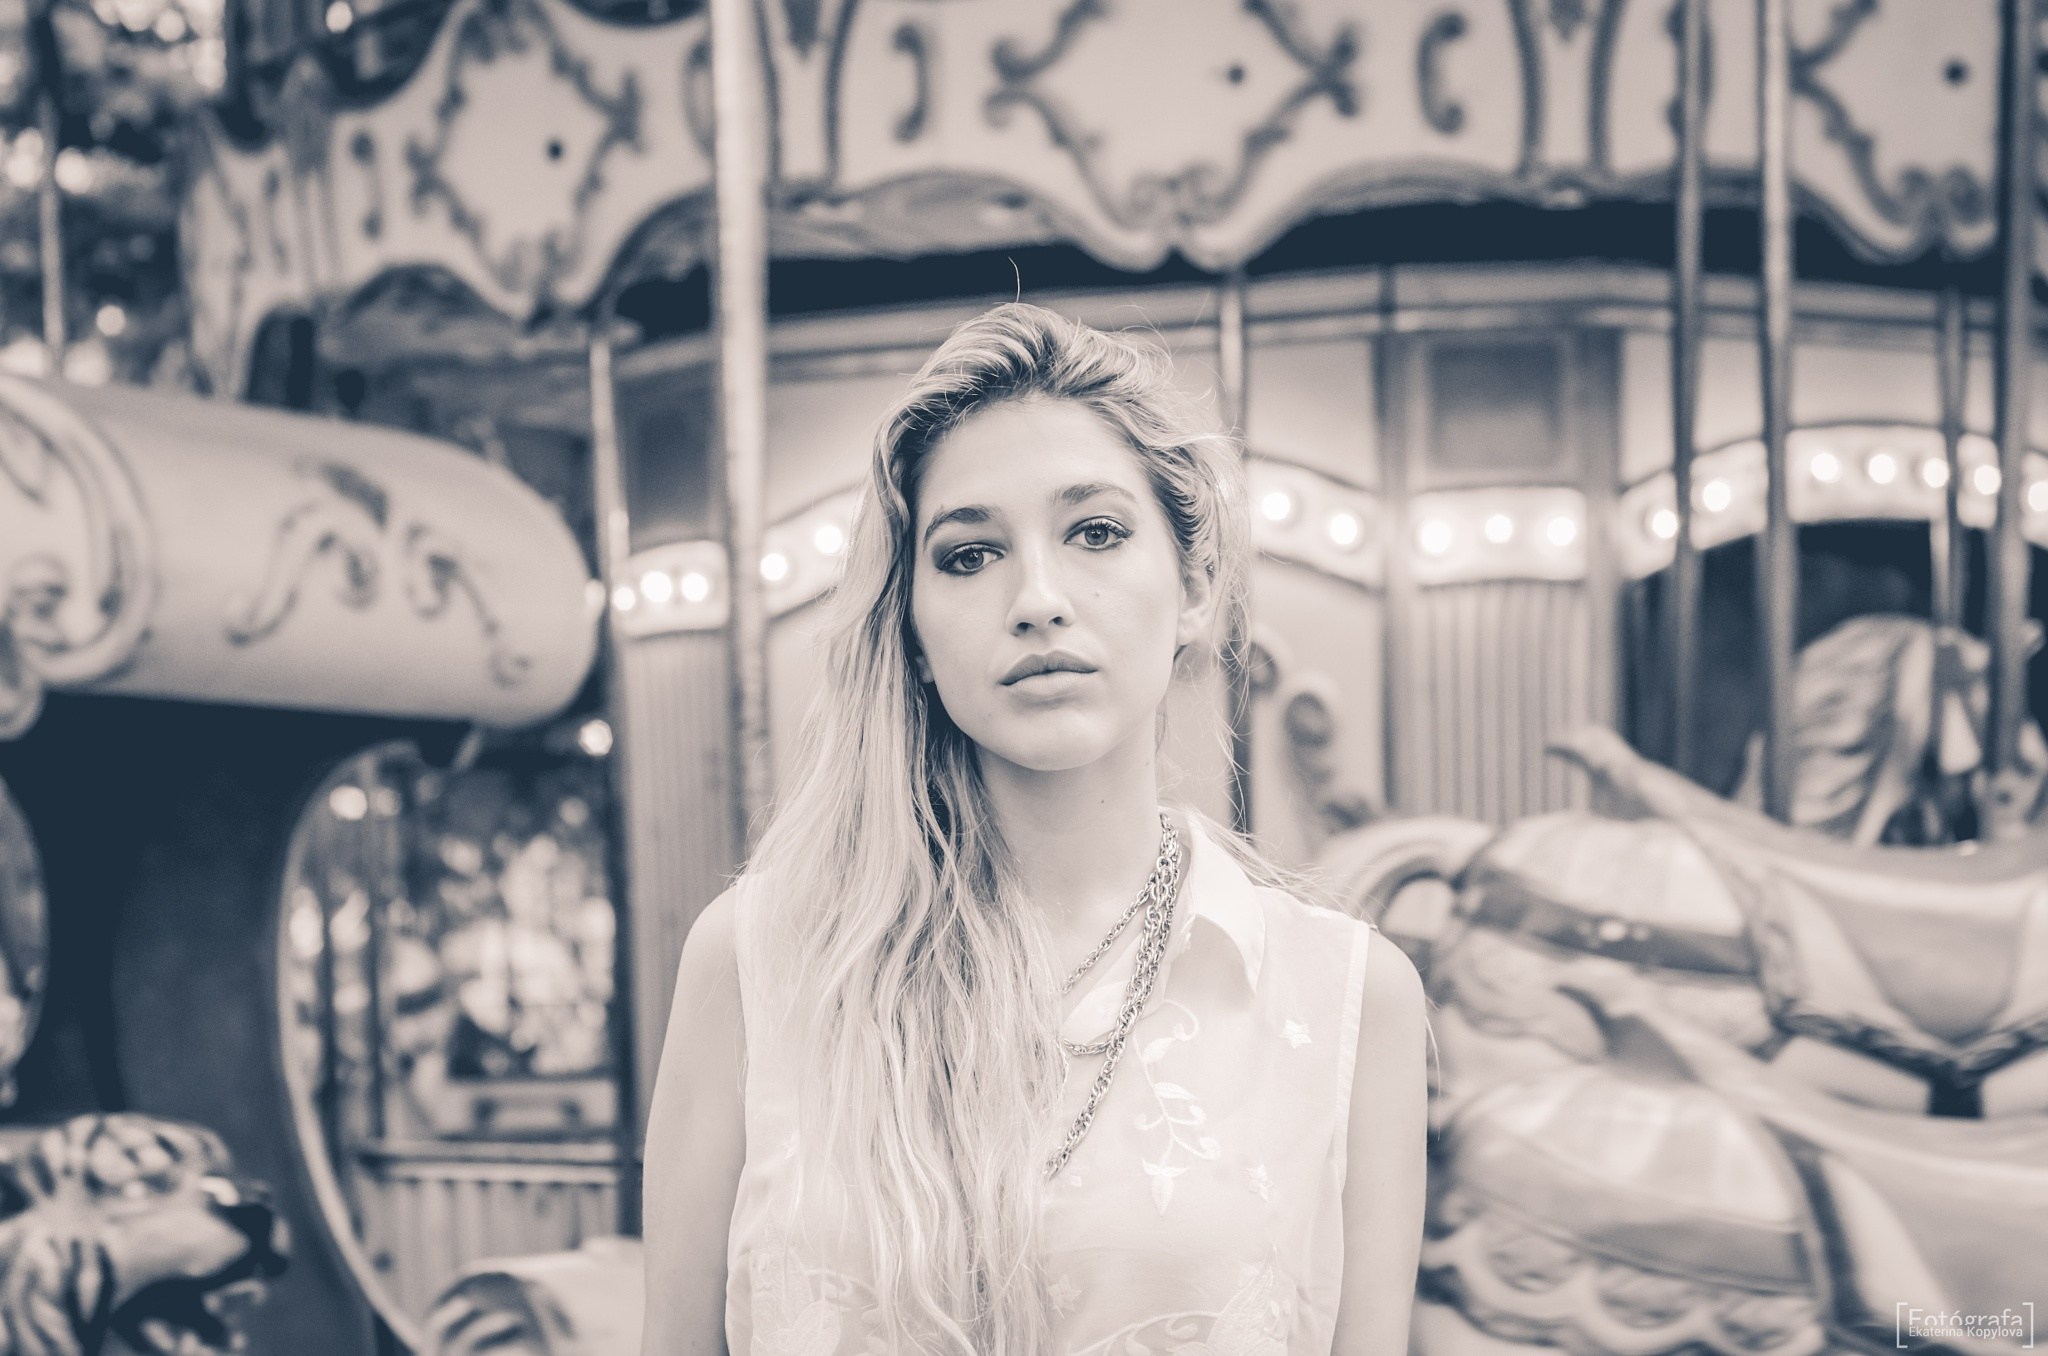 Carrousel by Ekaterina Kopylova